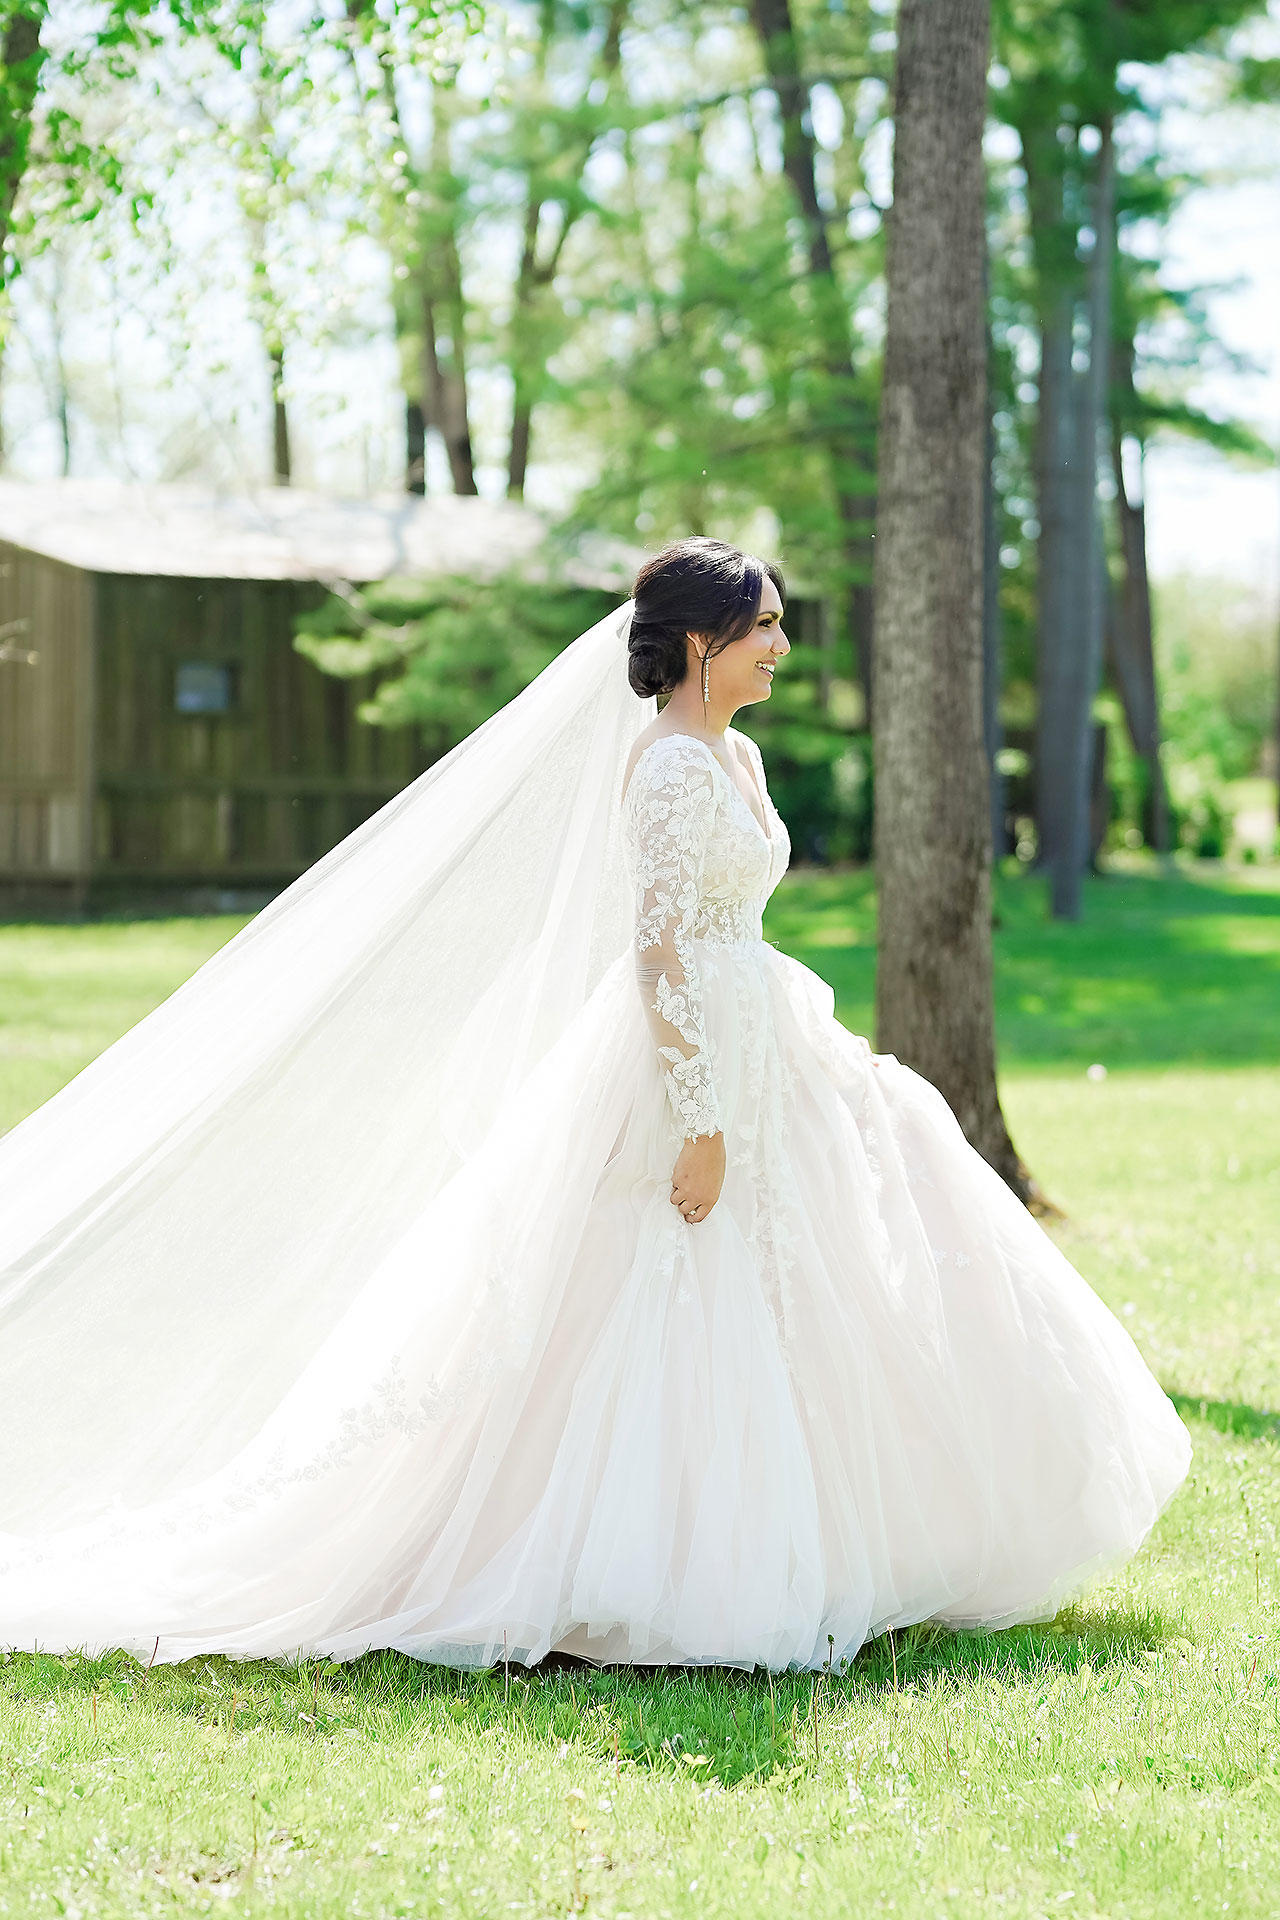 Nadia Parker Black Iris Estate Carmel Indiana Wedding May 2021 047